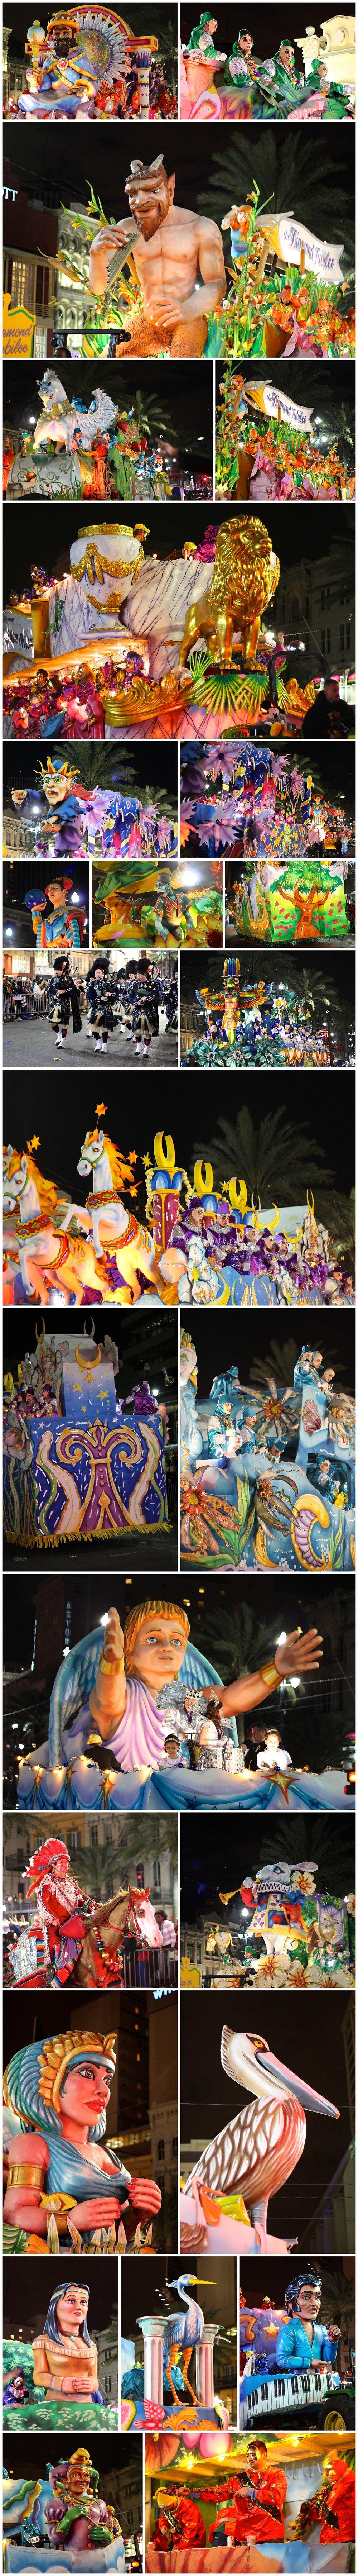 Hermes, D'Etat, Morpheus Mardi Gras parades in New Orleans